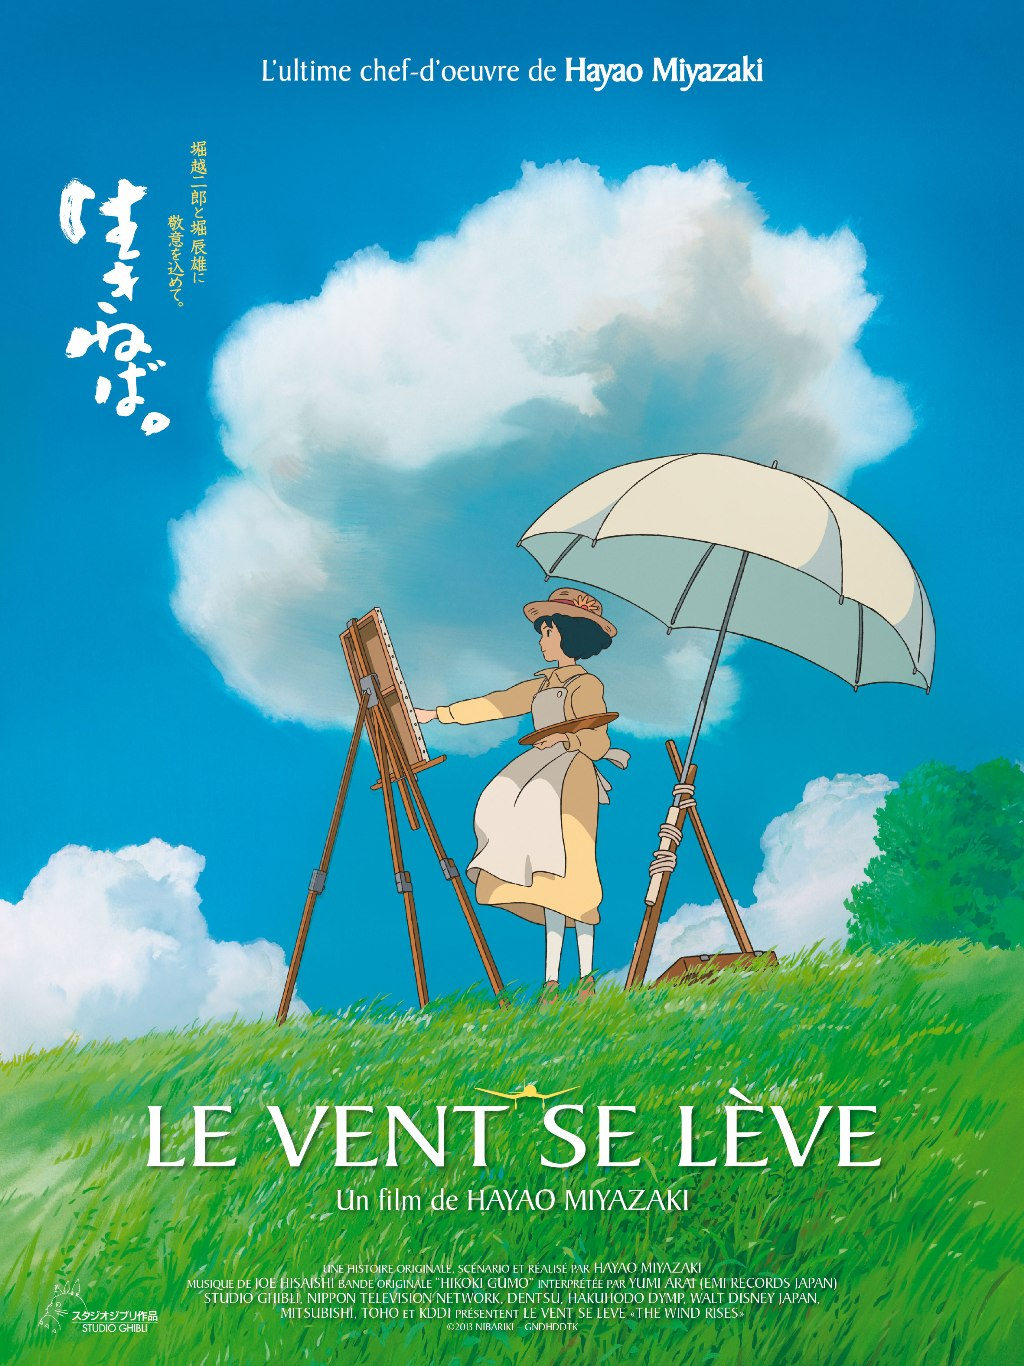 http://braindamaged.fr/wp-content/uploads/2013/10/le-vent-se-leve-affiche-du-dernier-hayao-miyazaki-affiche.jpg